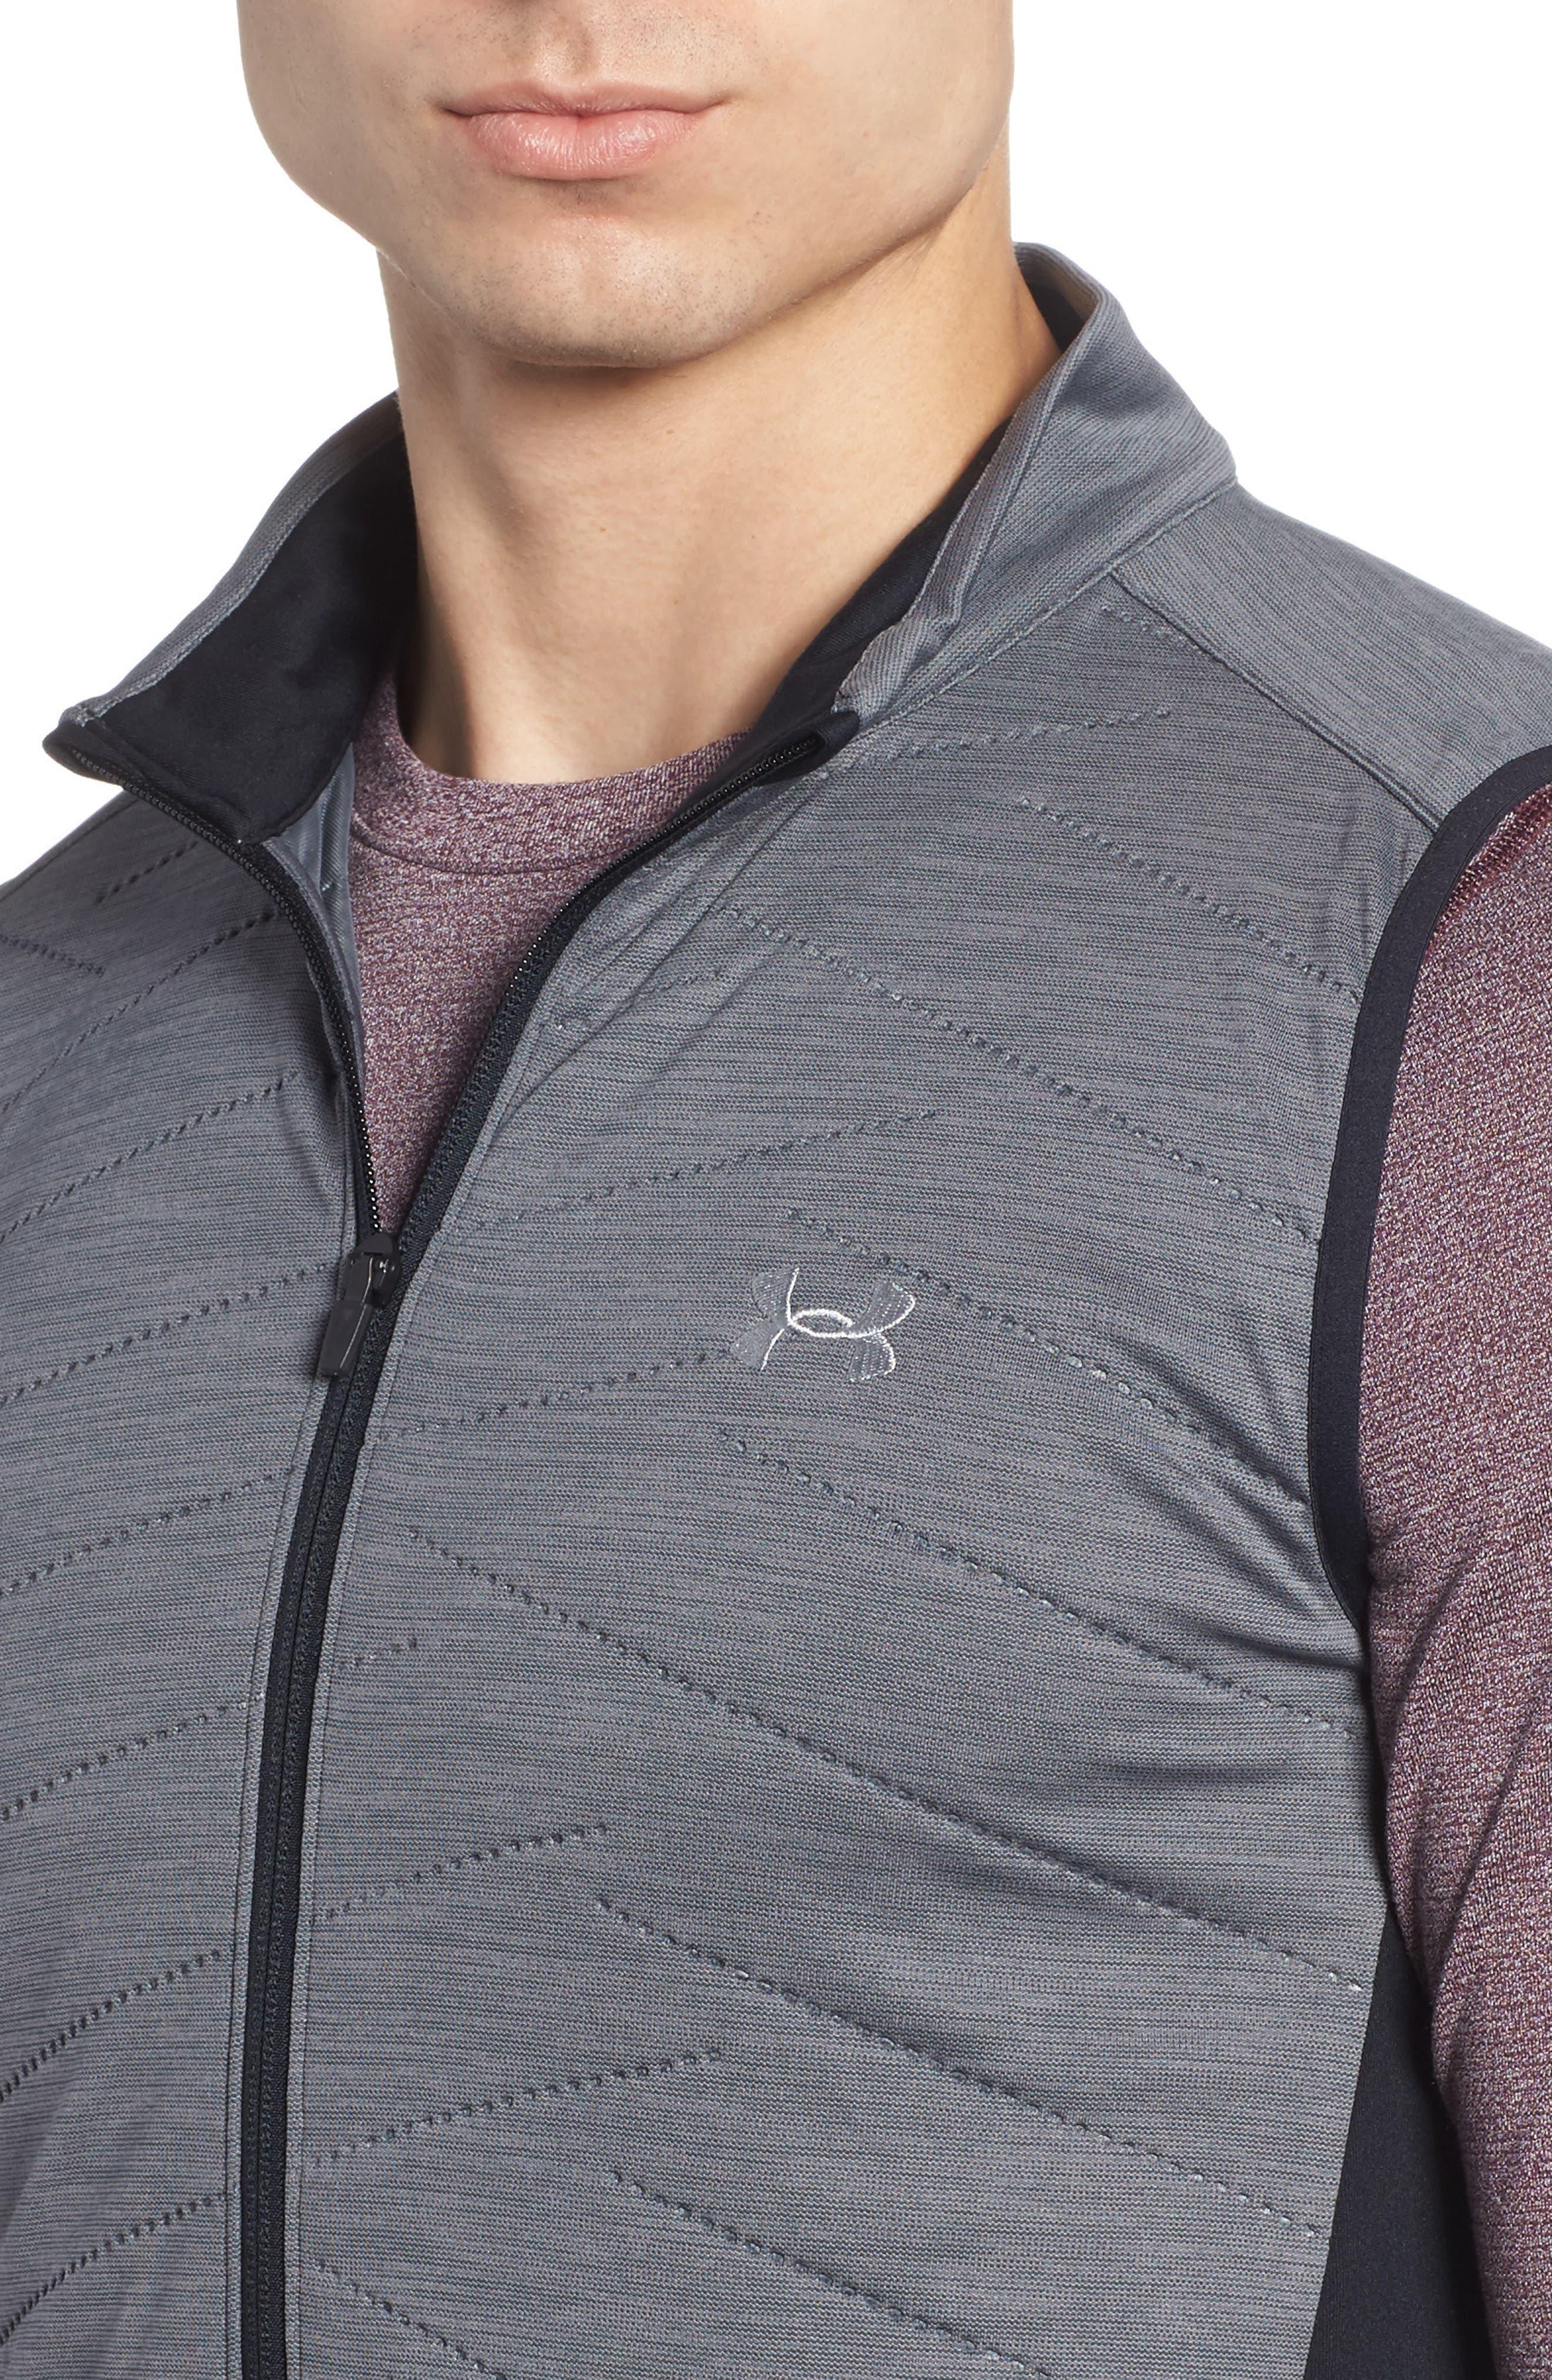 Reactor Hybrid Zip Vest,                             Alternate thumbnail 4, color,                             Rhino Grey / Black / Grey